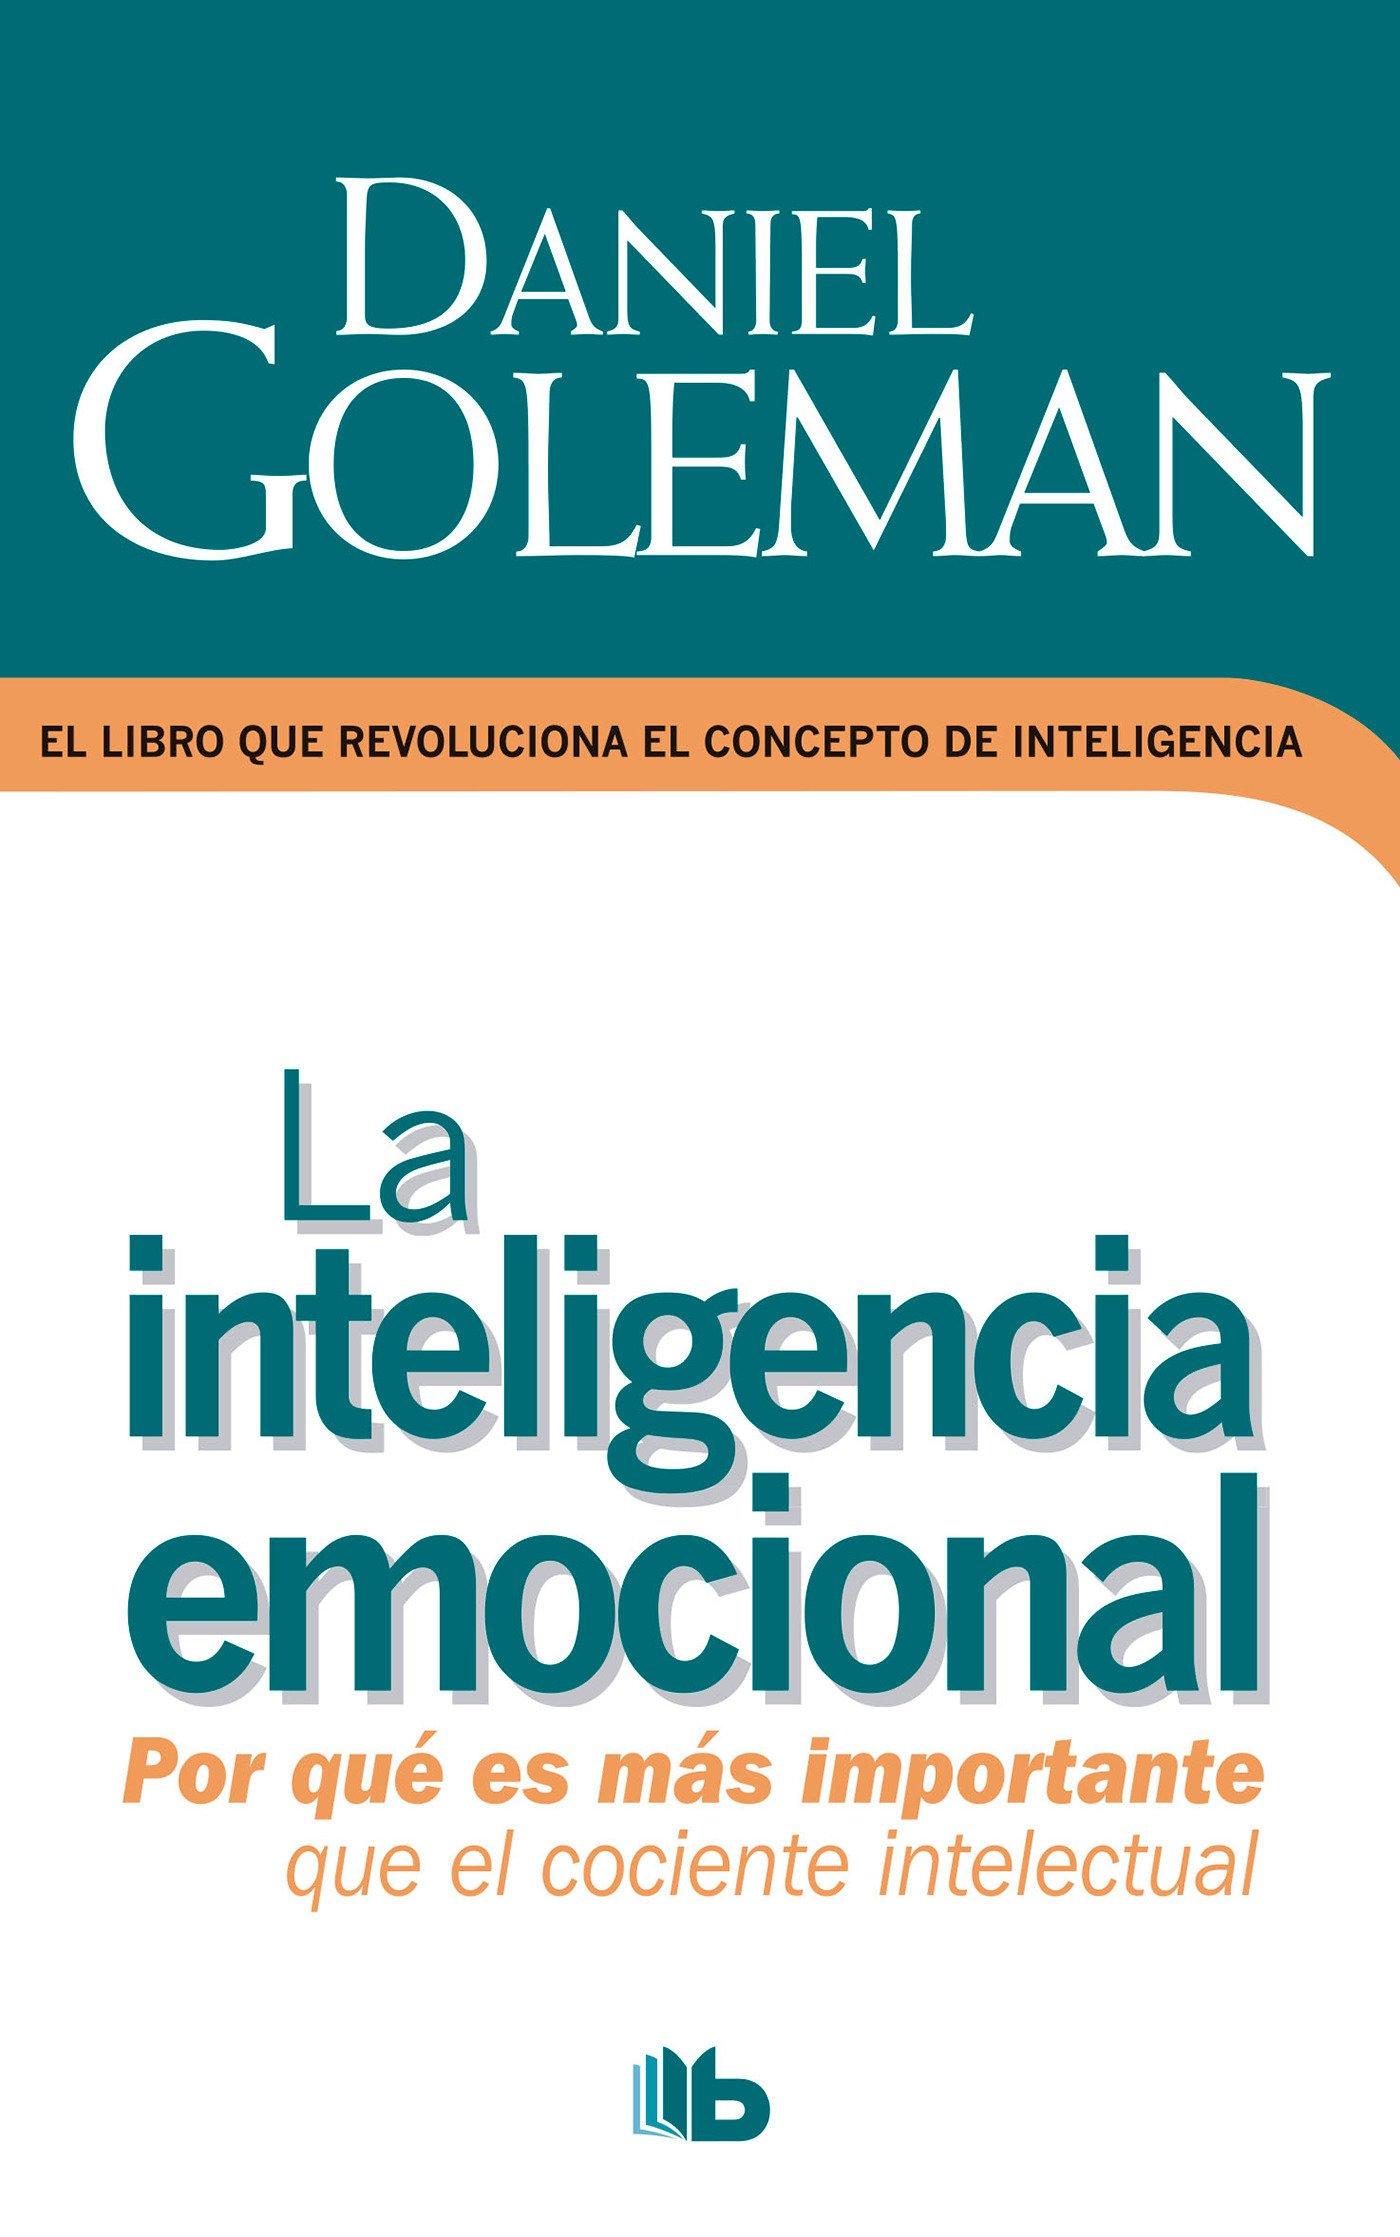 La Inteligencia Emocional Emotional Intelligence Spanish Edition Goleman Daniel 9786074803211 Books